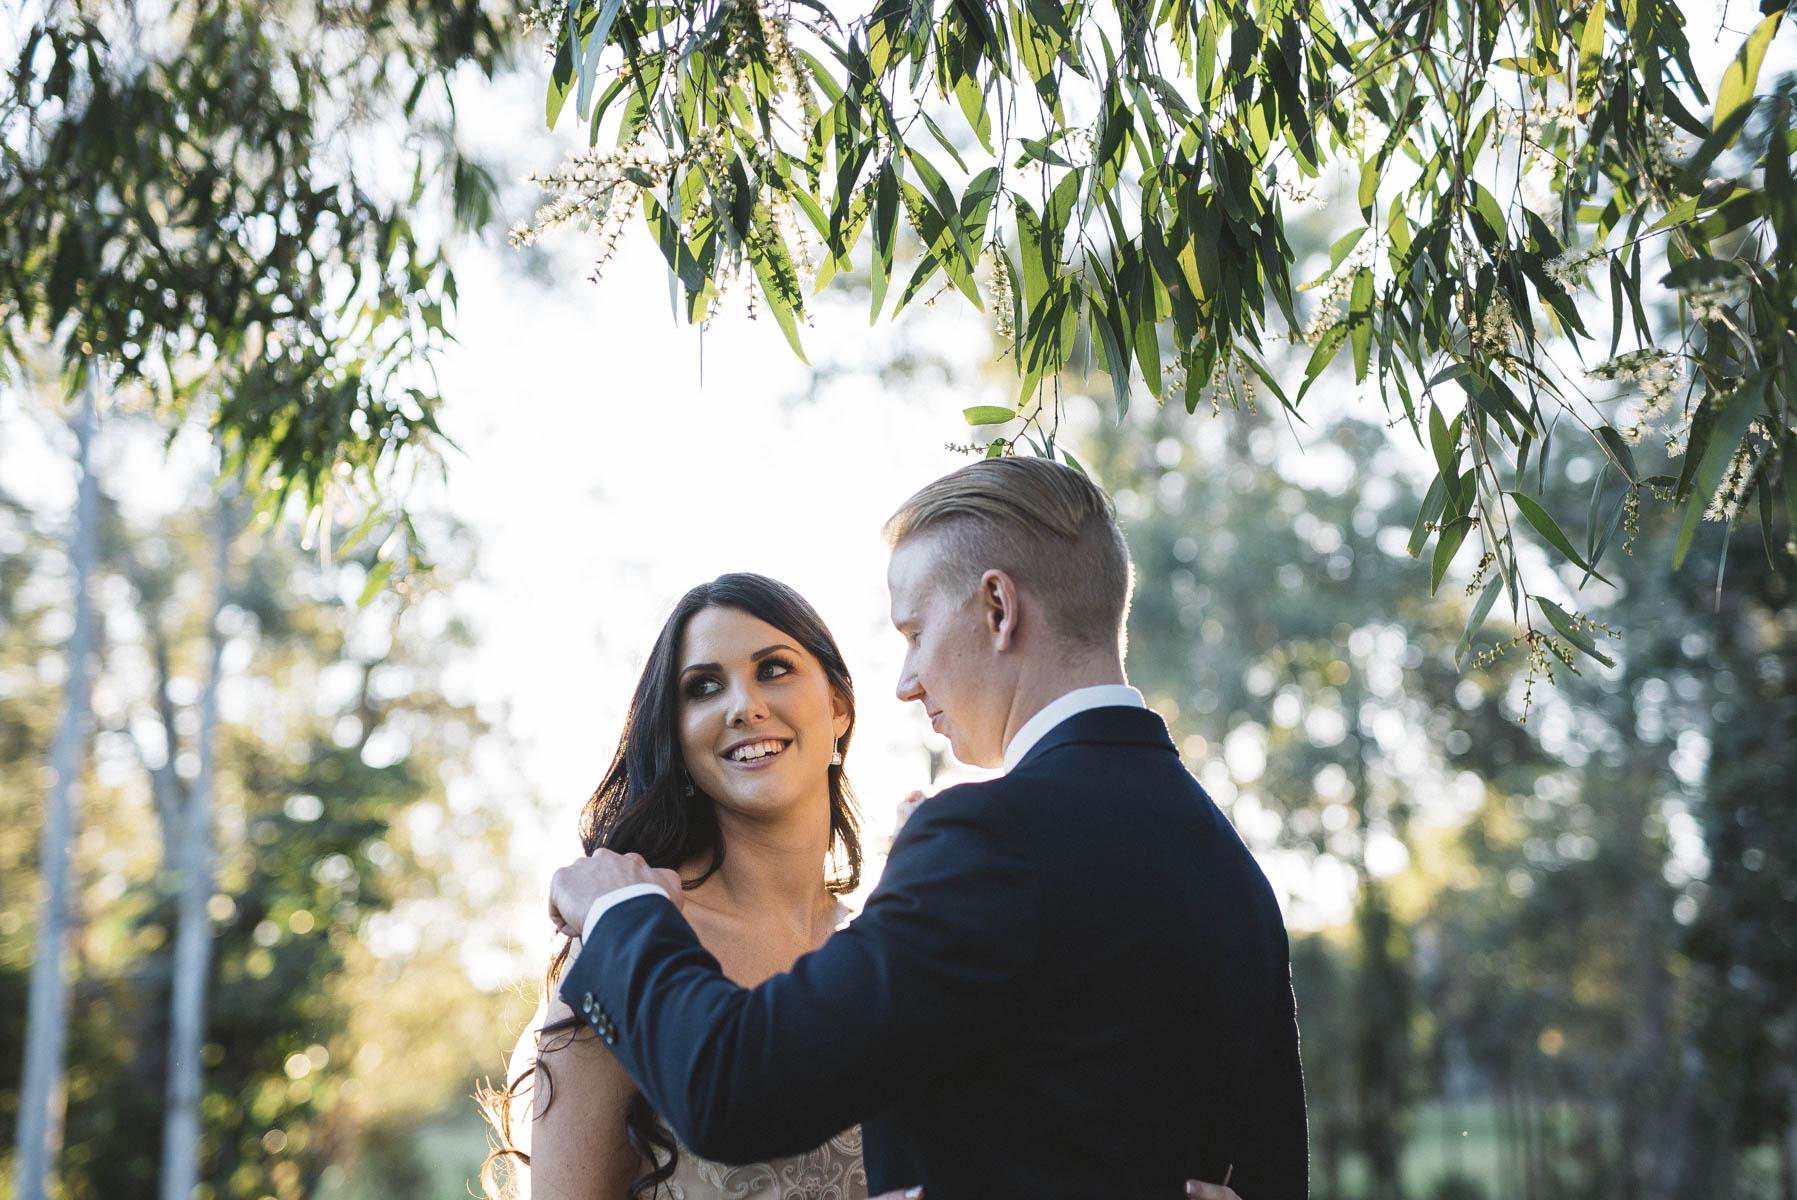 Glenn + Nicole | Gold Coast Wedding Video | 08/07/2017 | Gold Coast, QLD